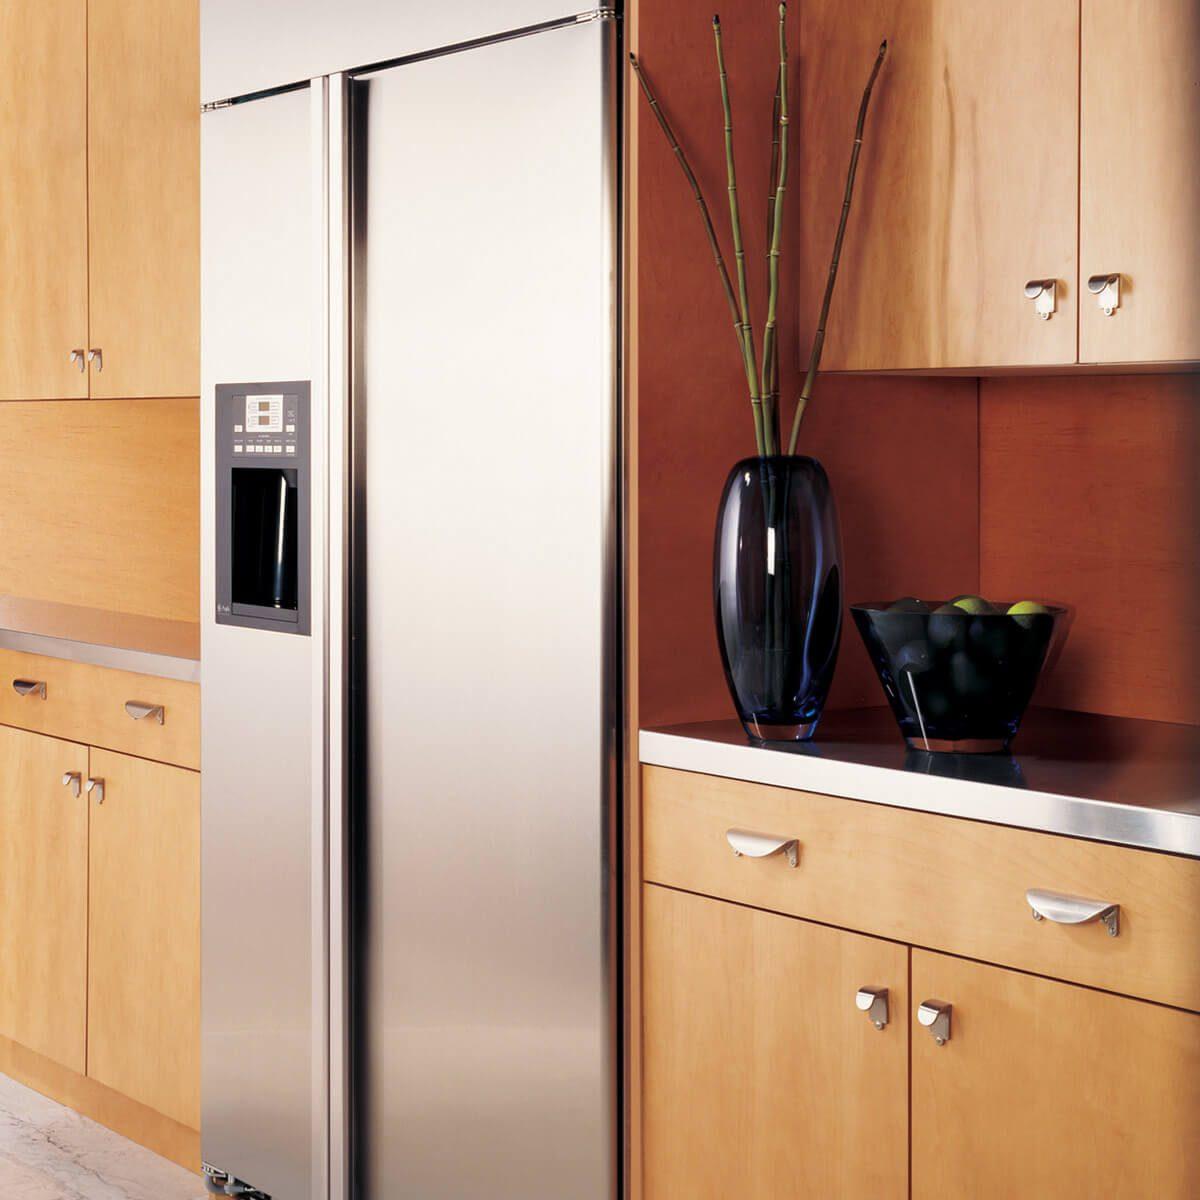 Consider a Cabinet-Depth Refrigerator